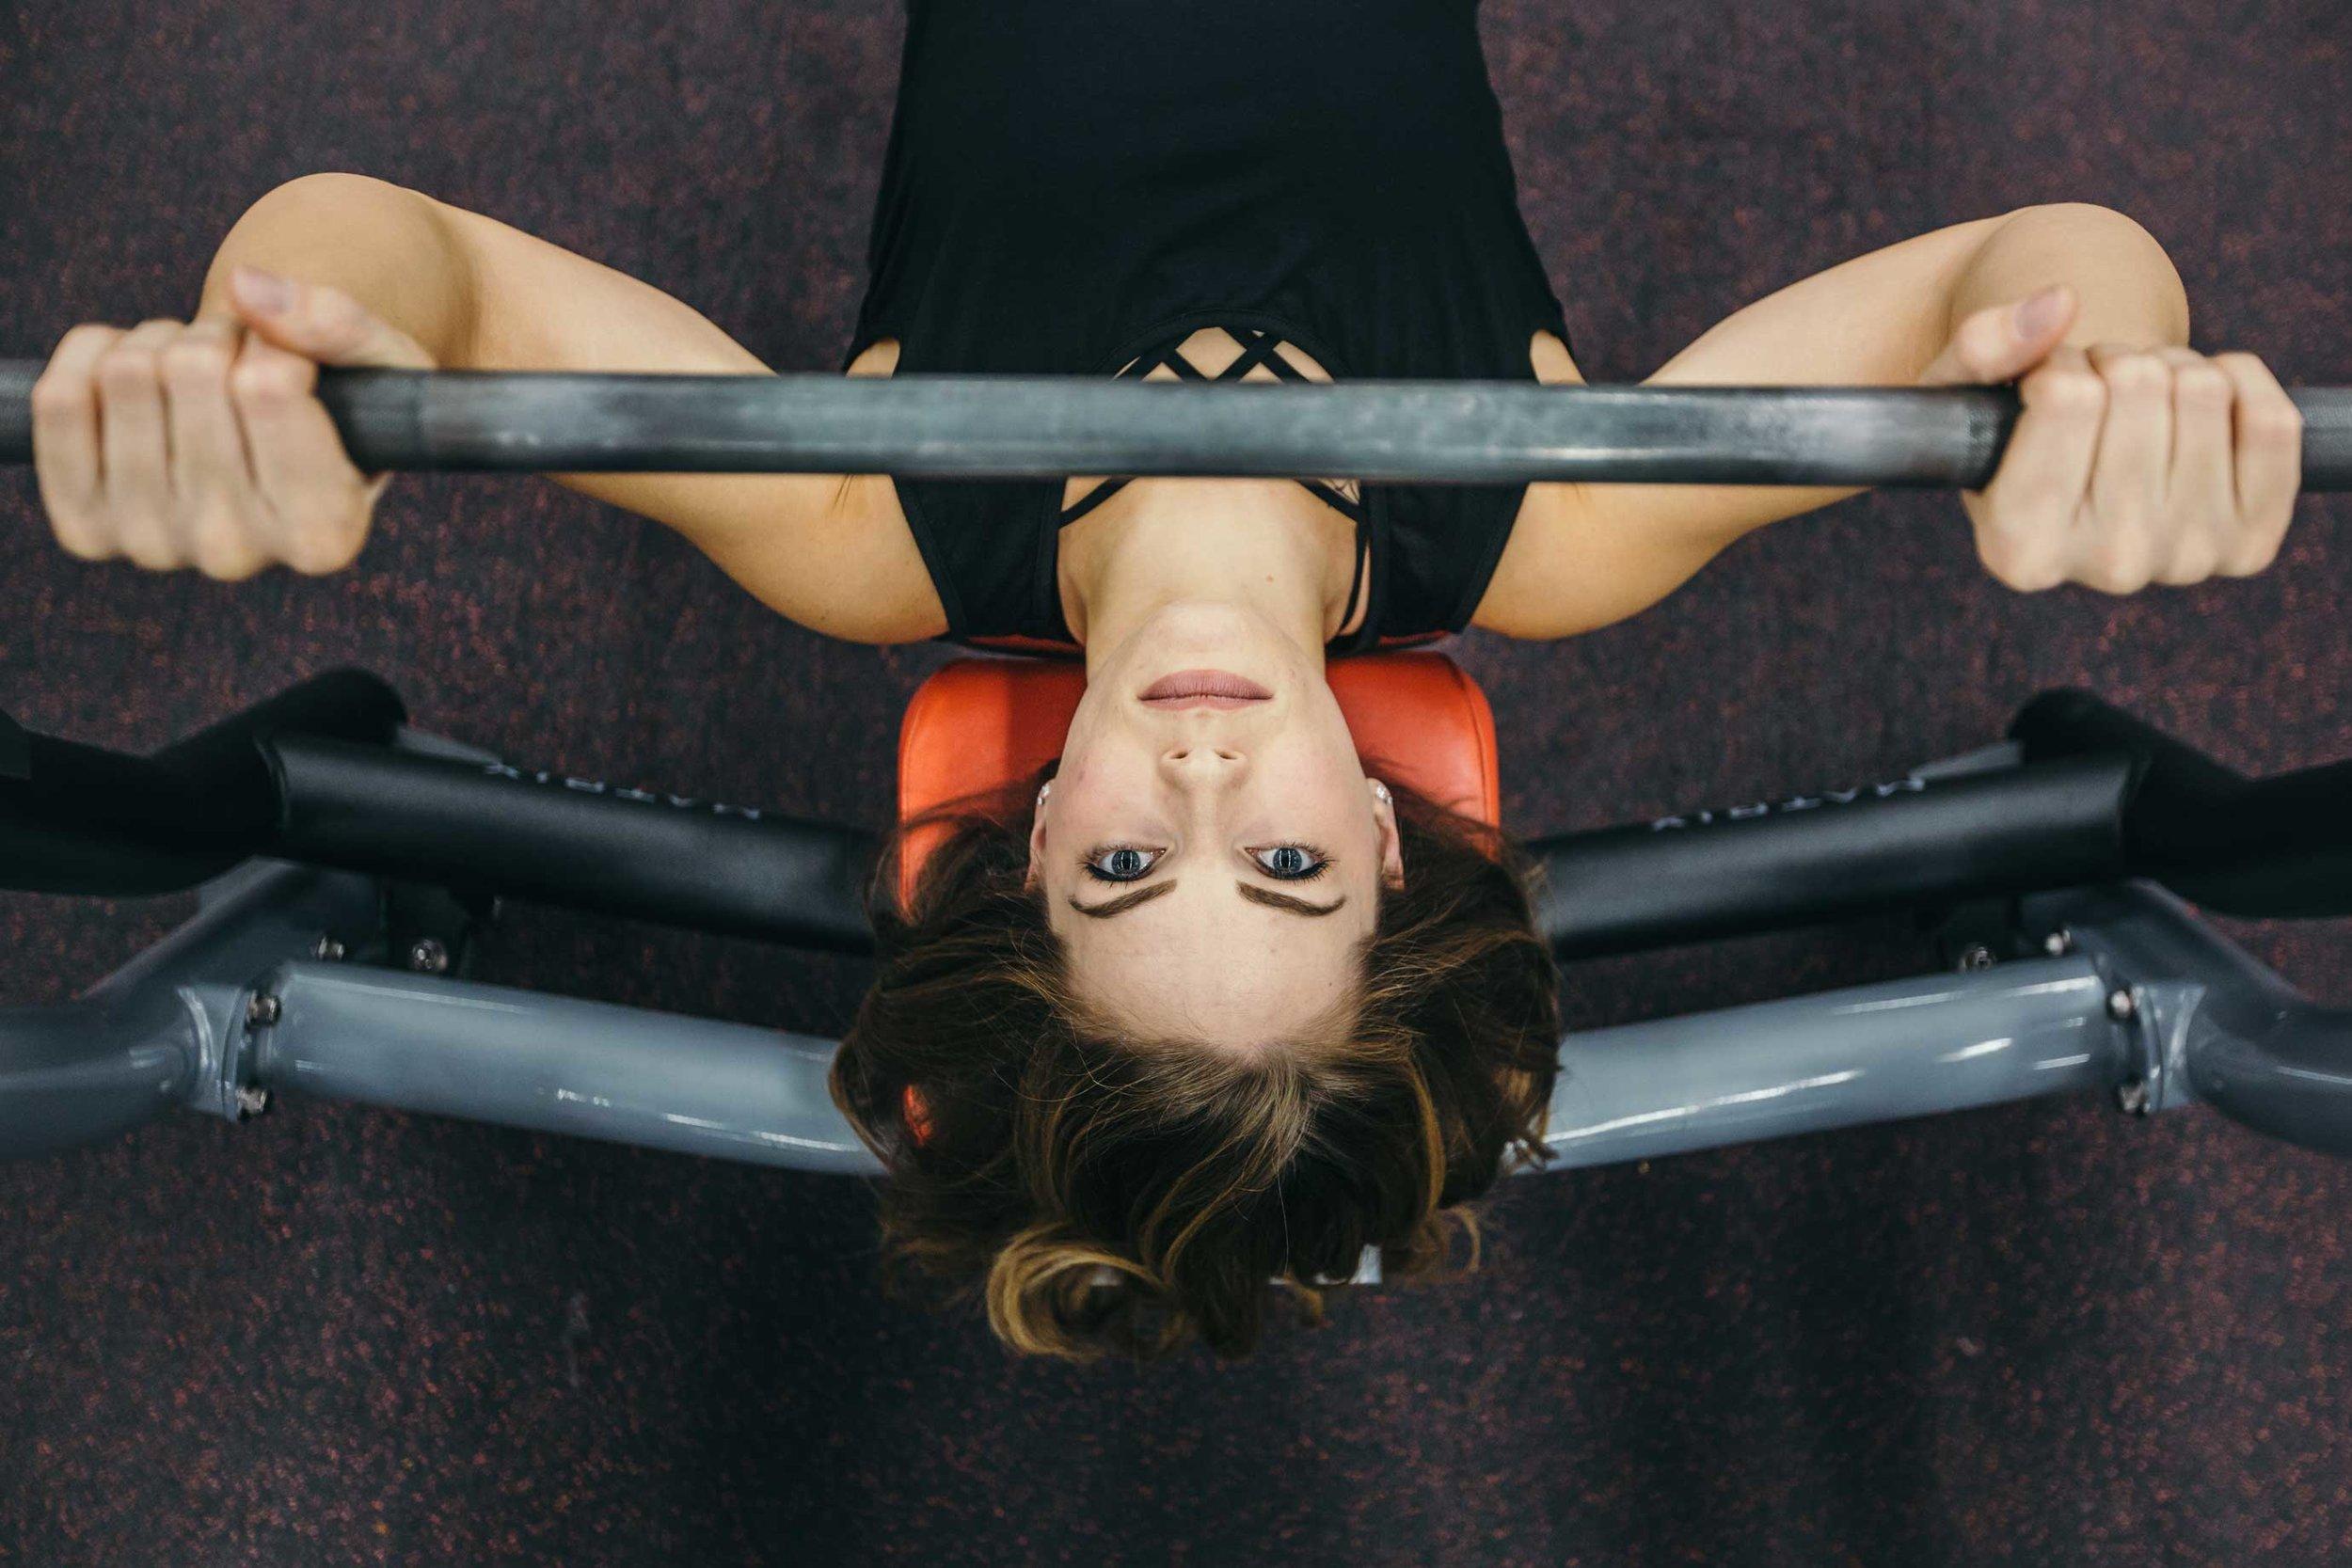 Kristen-Wallace-working-out.jpg